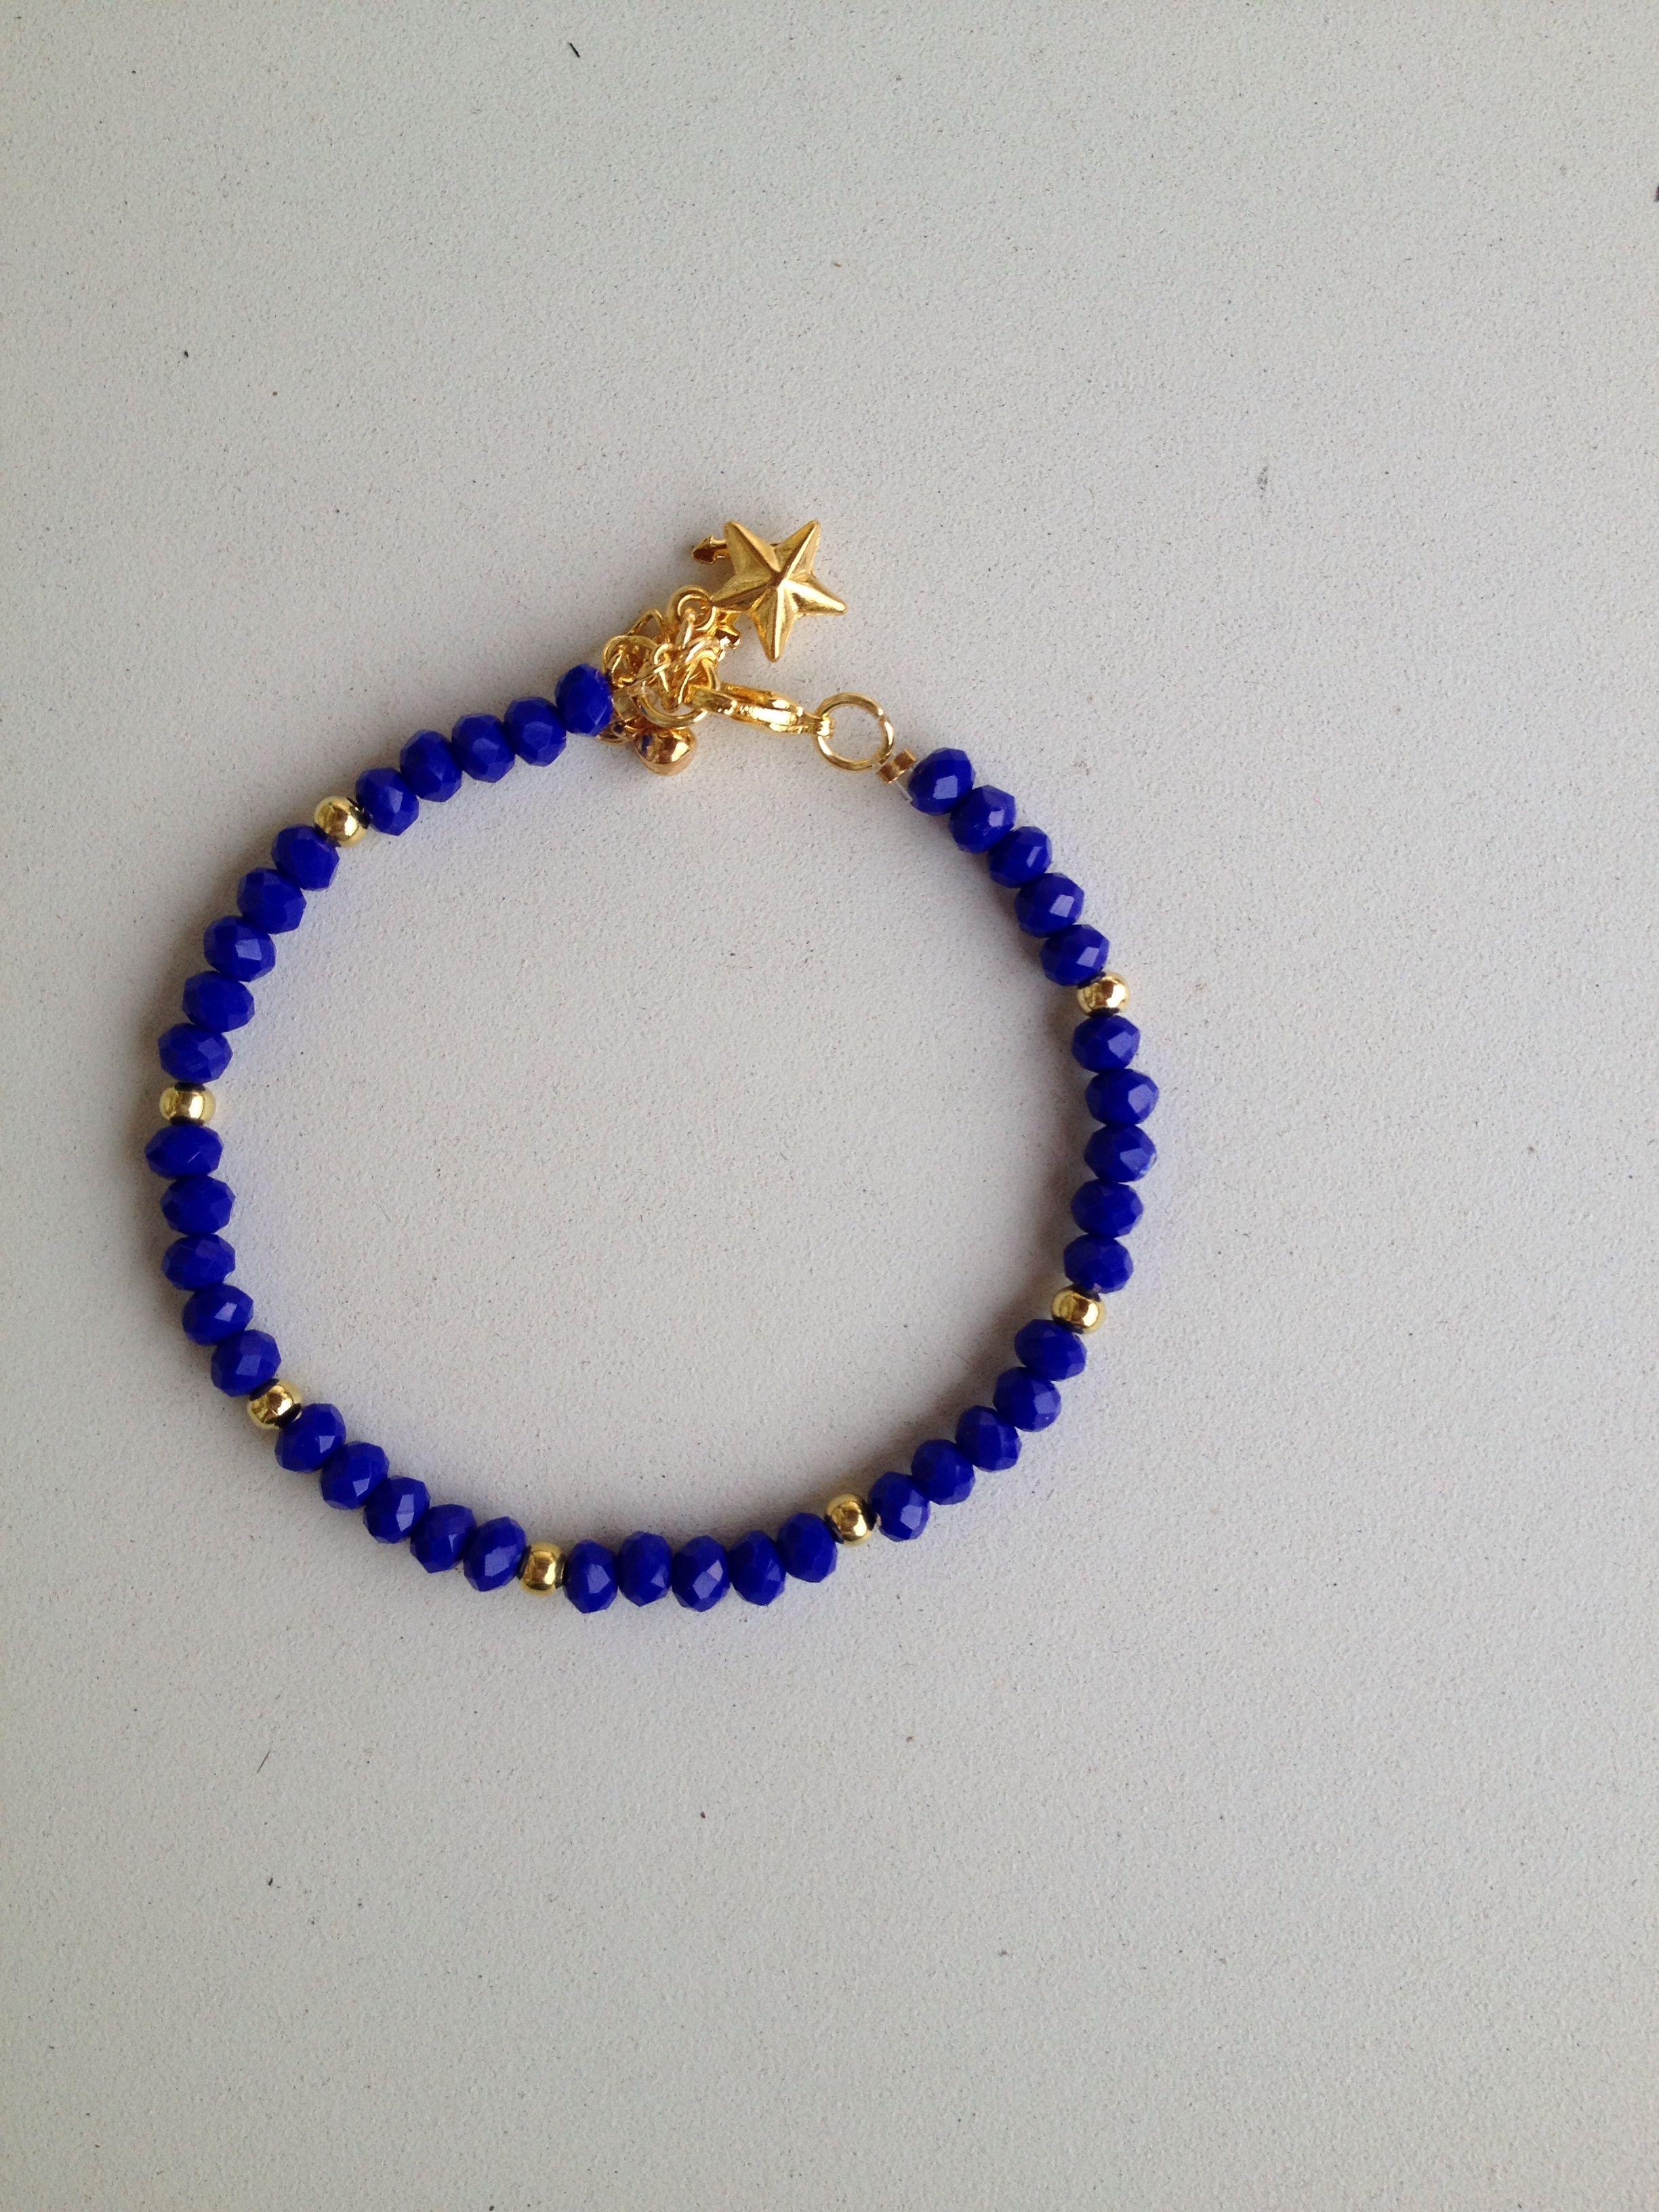 007ea3721cd5 Blue chinese crystal bracelet pulseira de cristal chines azul ...